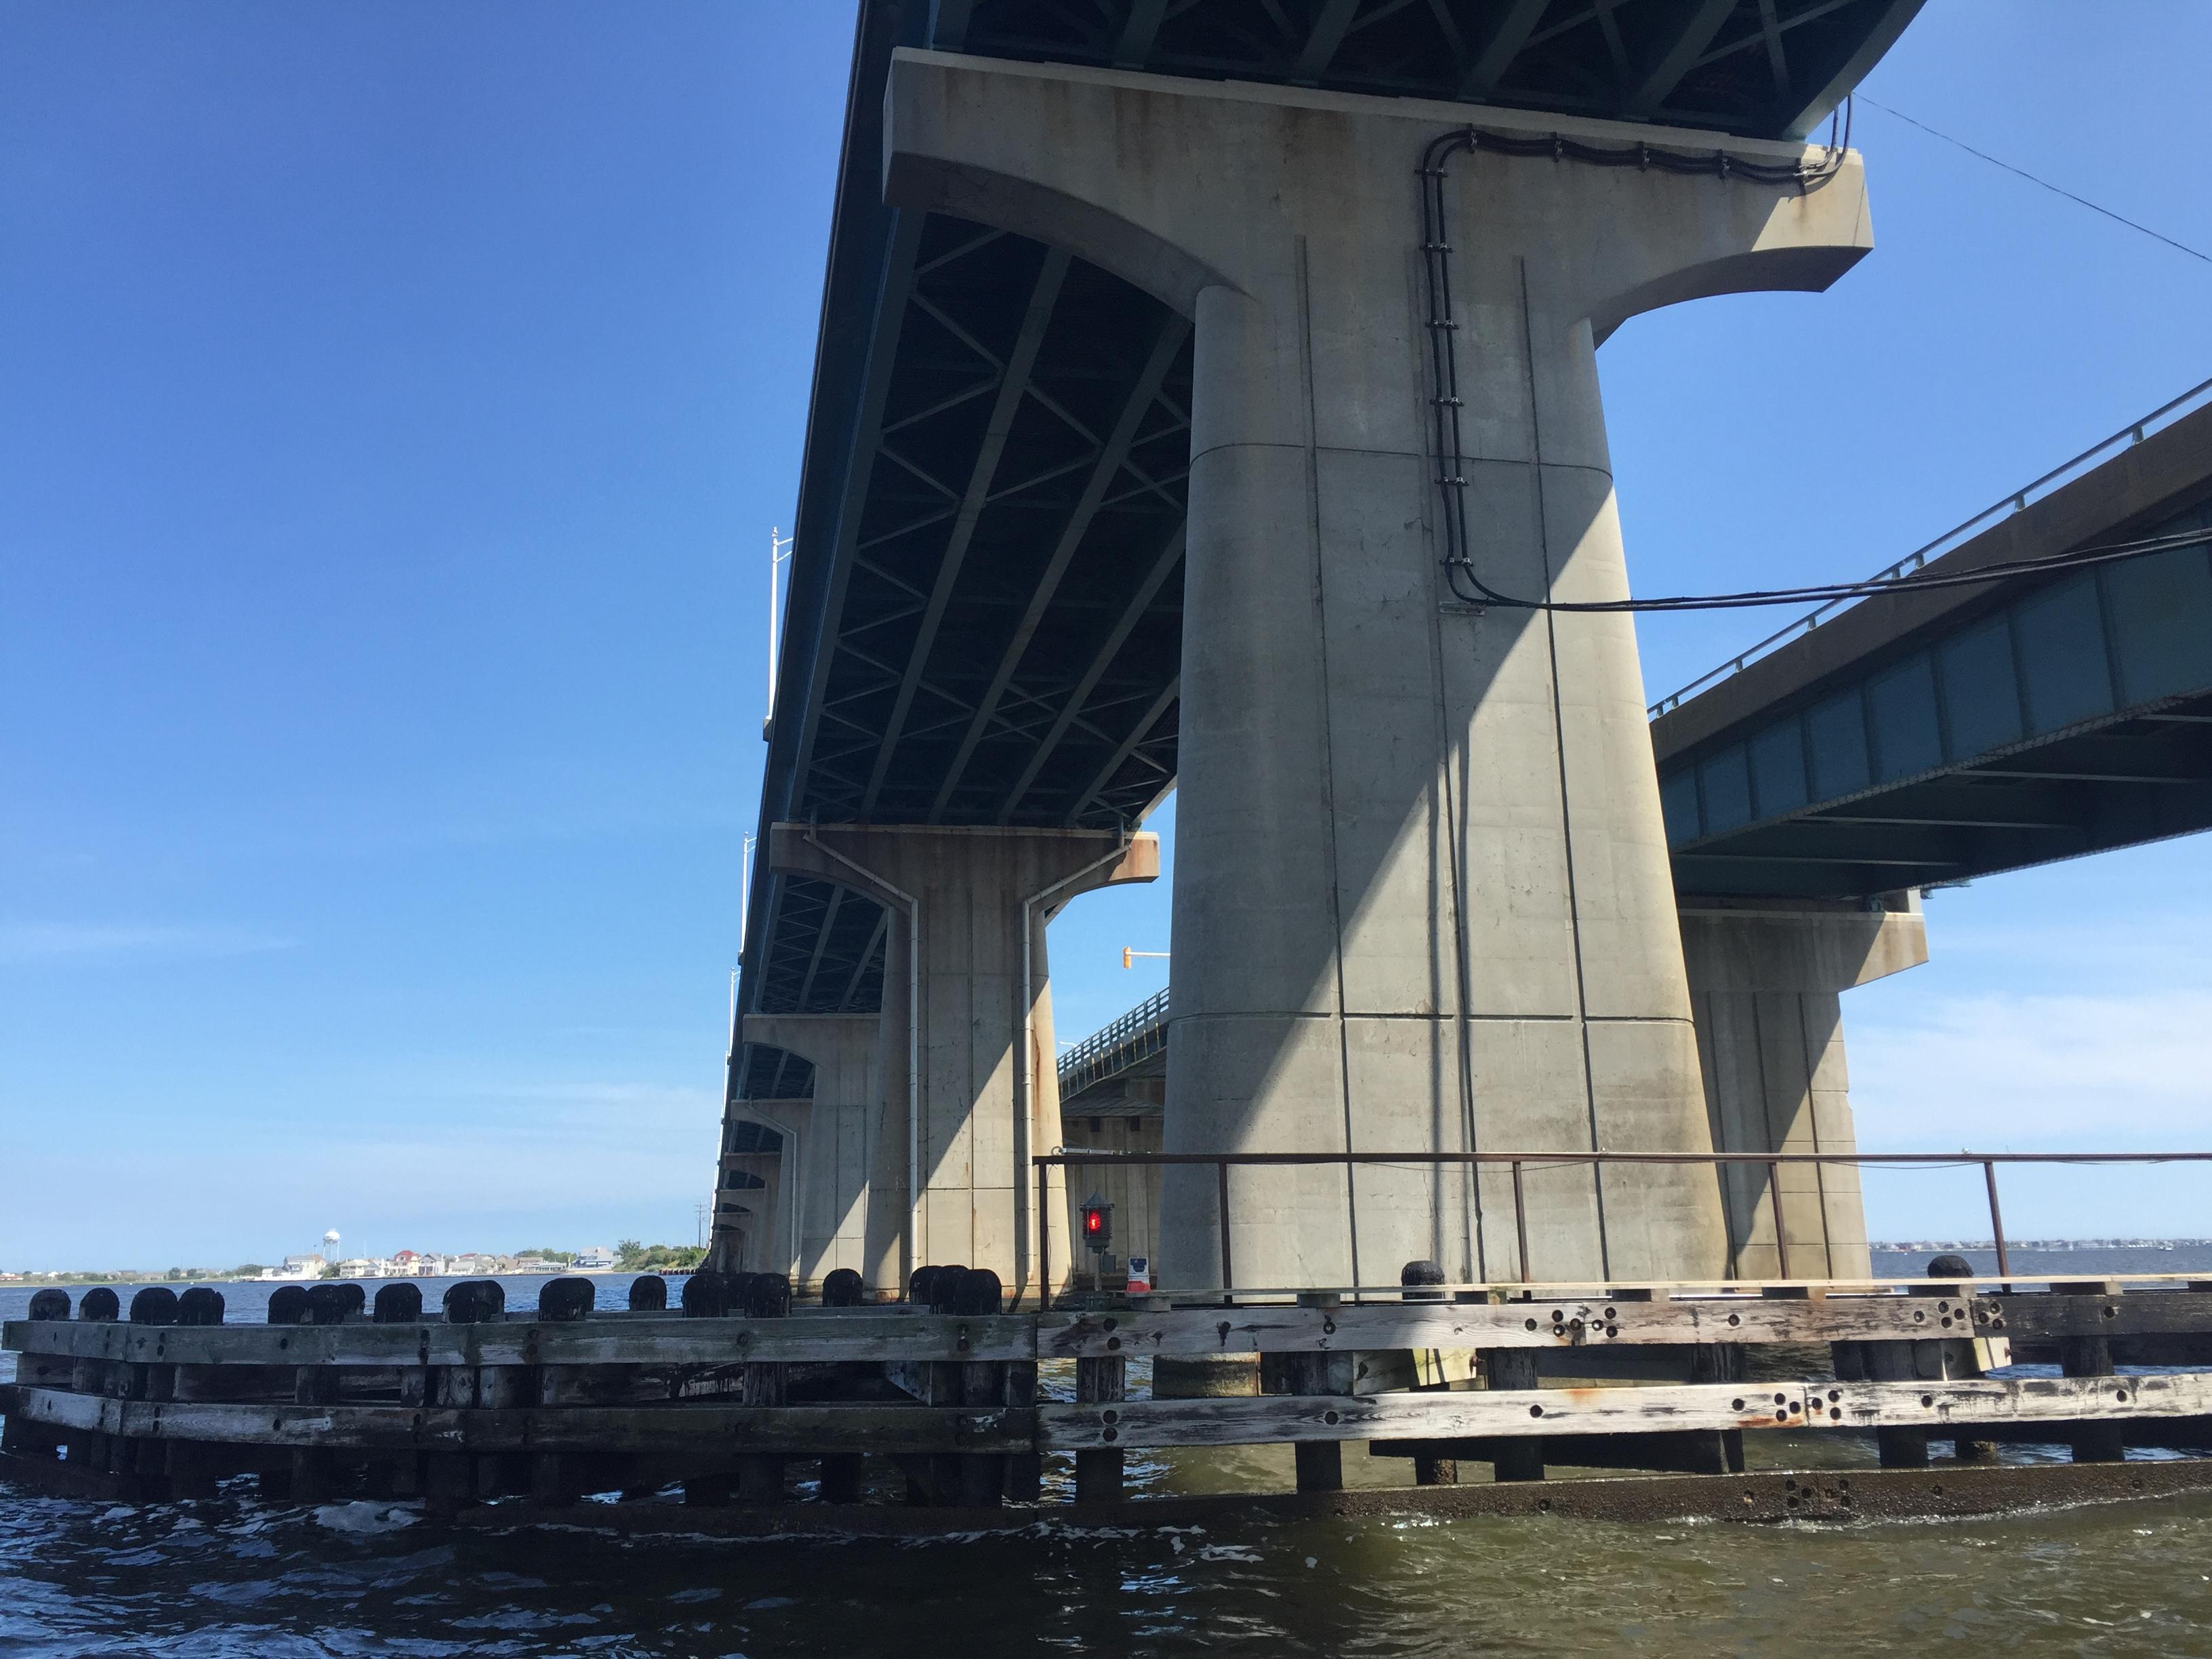 The J. Stanley Tunney and Thomas A. Mathis bridges. (Photo: Daniel Nee)